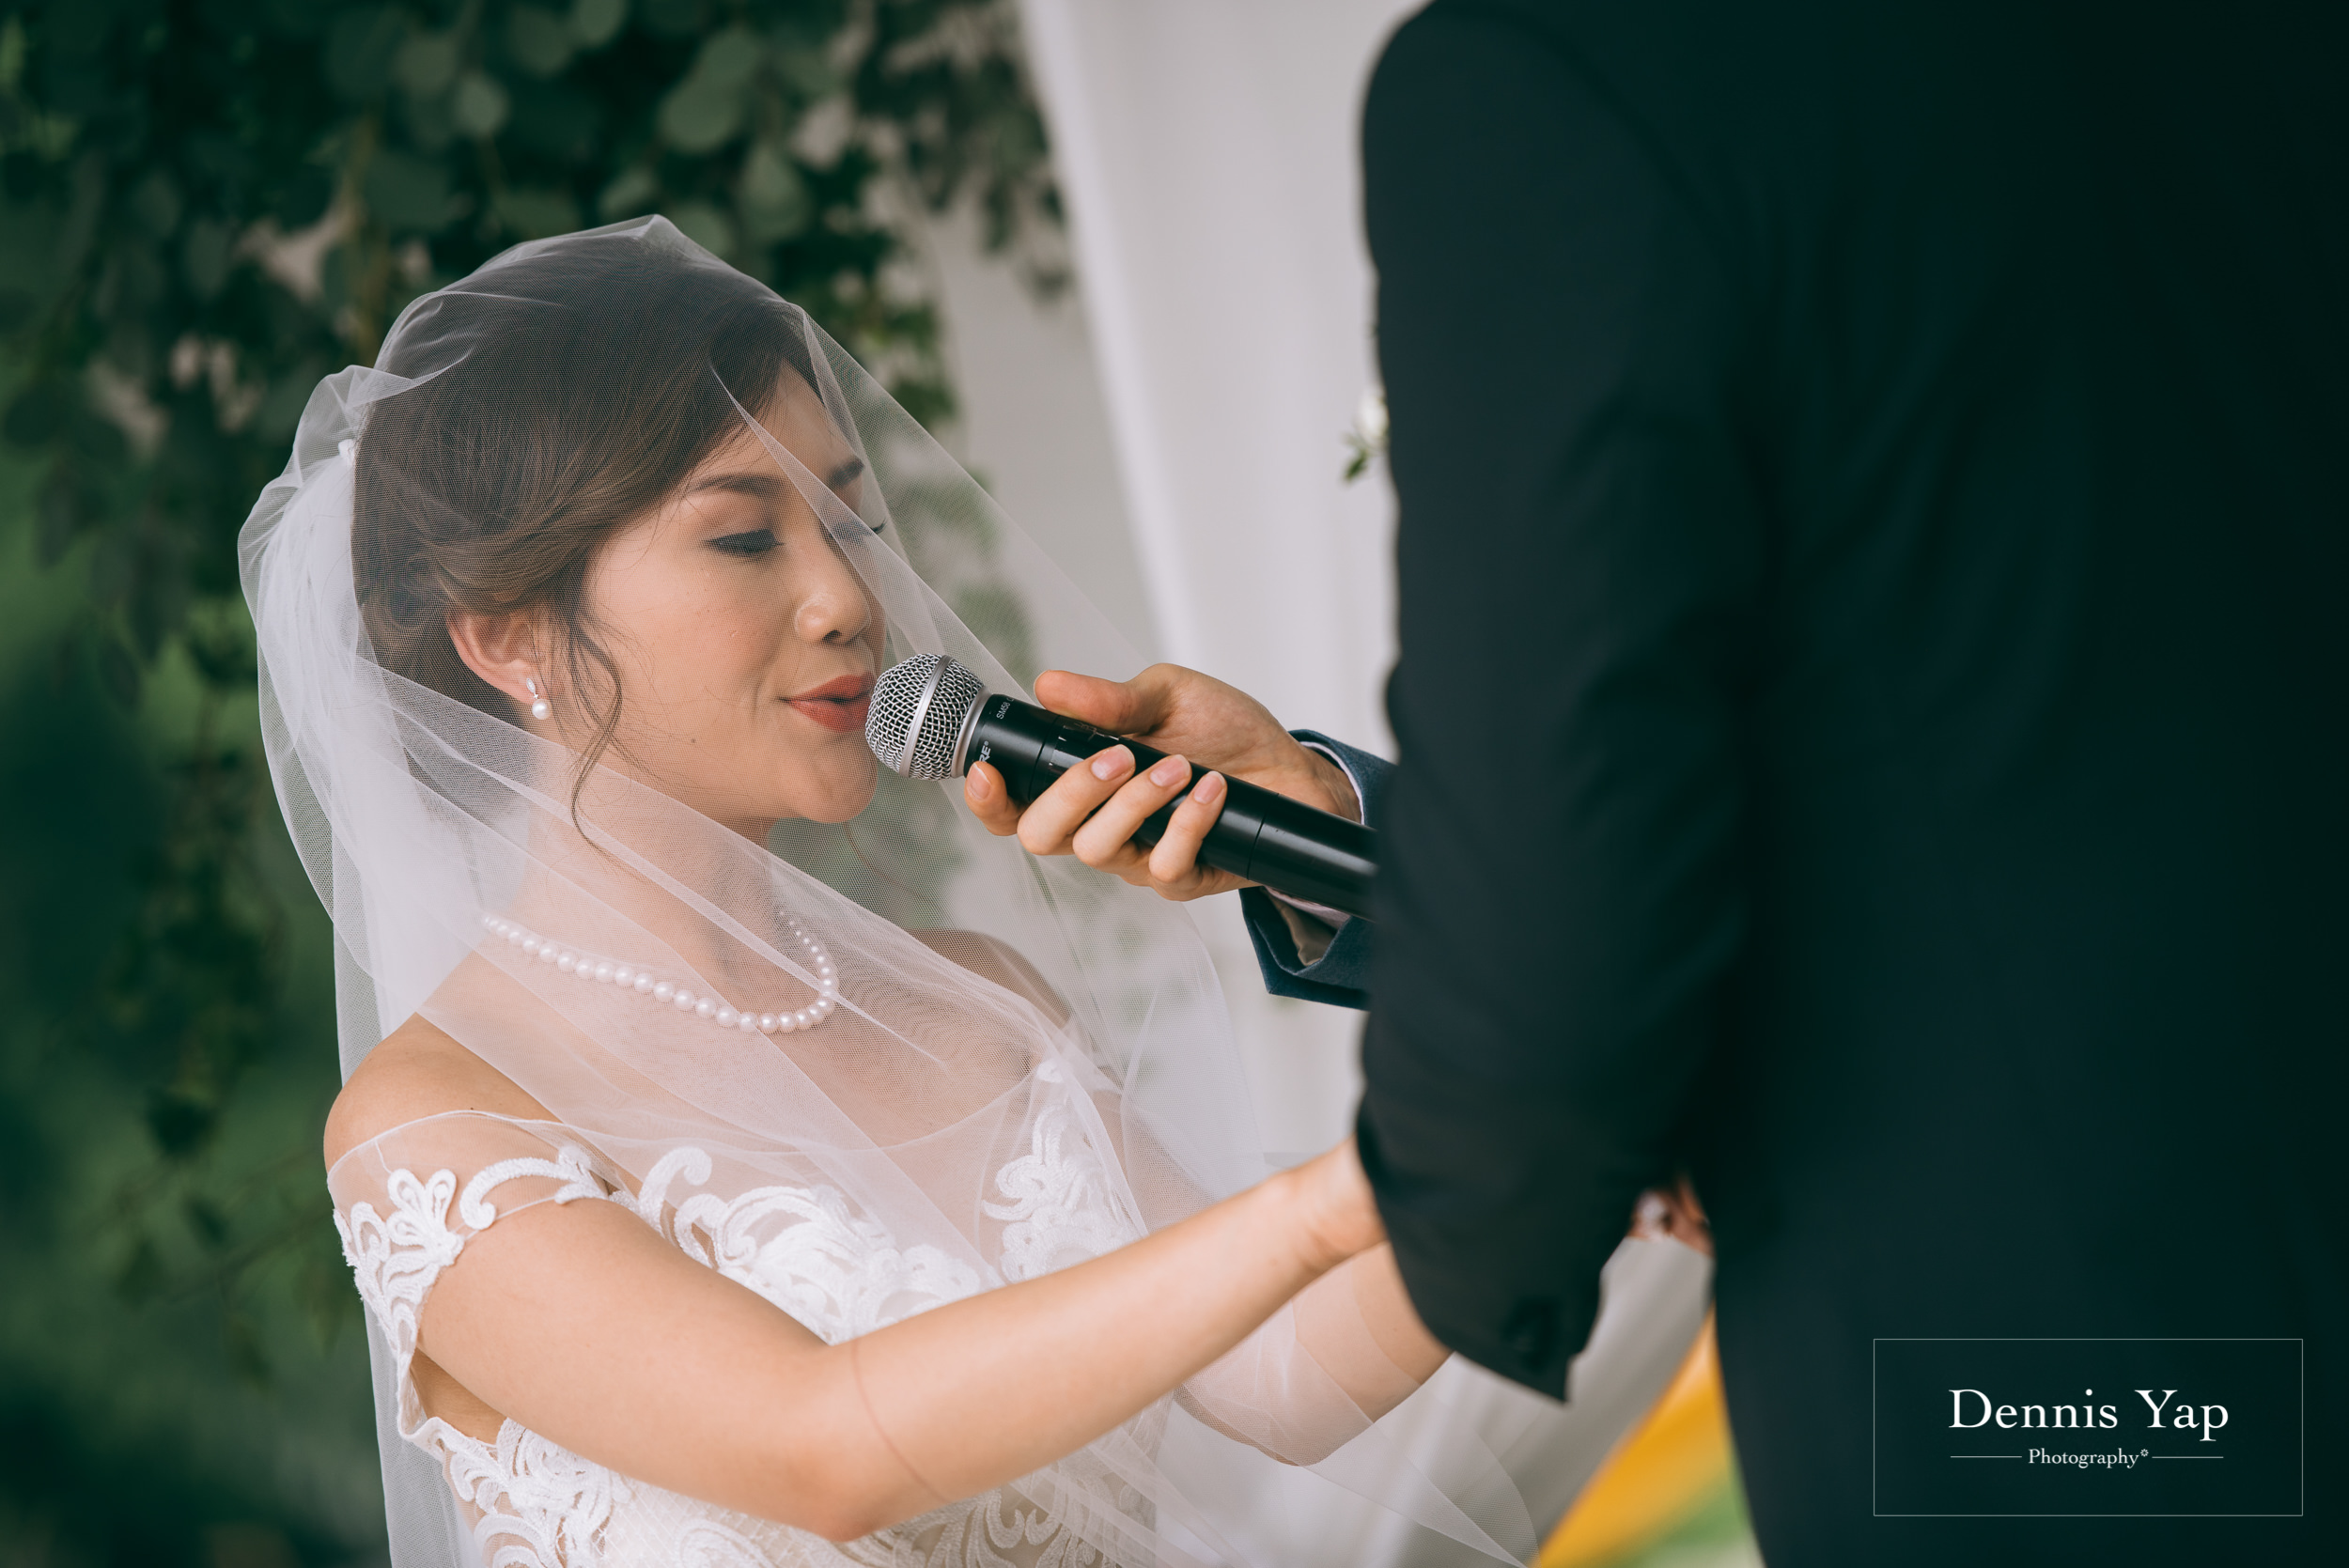 lionel joanne garden wedding majestic hotel dennis yap photography malaysia top wedding photographer-42.jpg